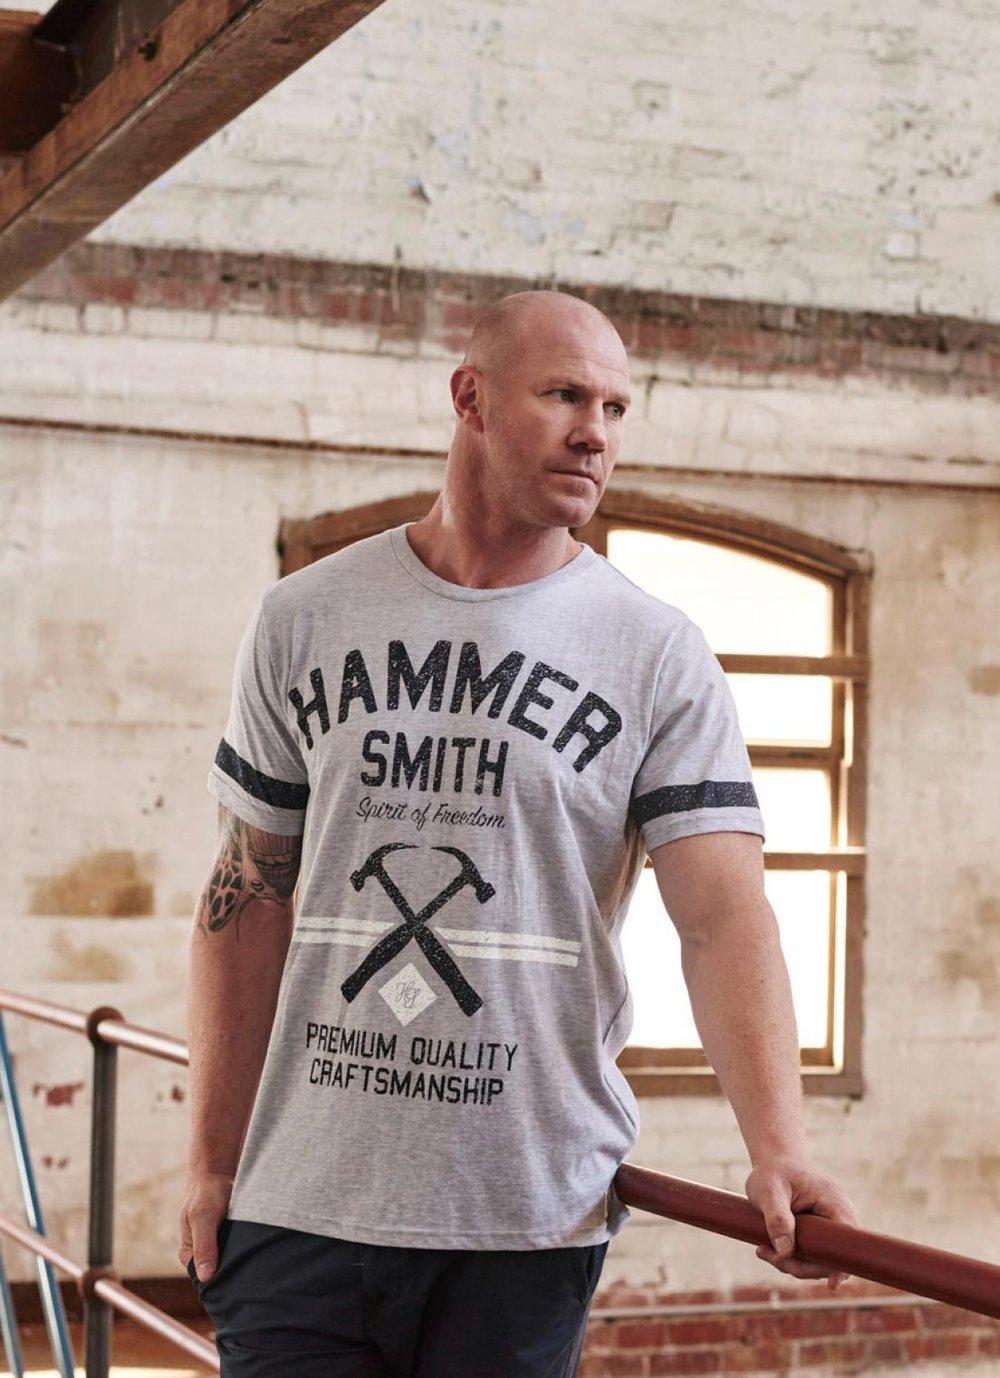 bc-brands-hero-images-Hammersmith.jpg